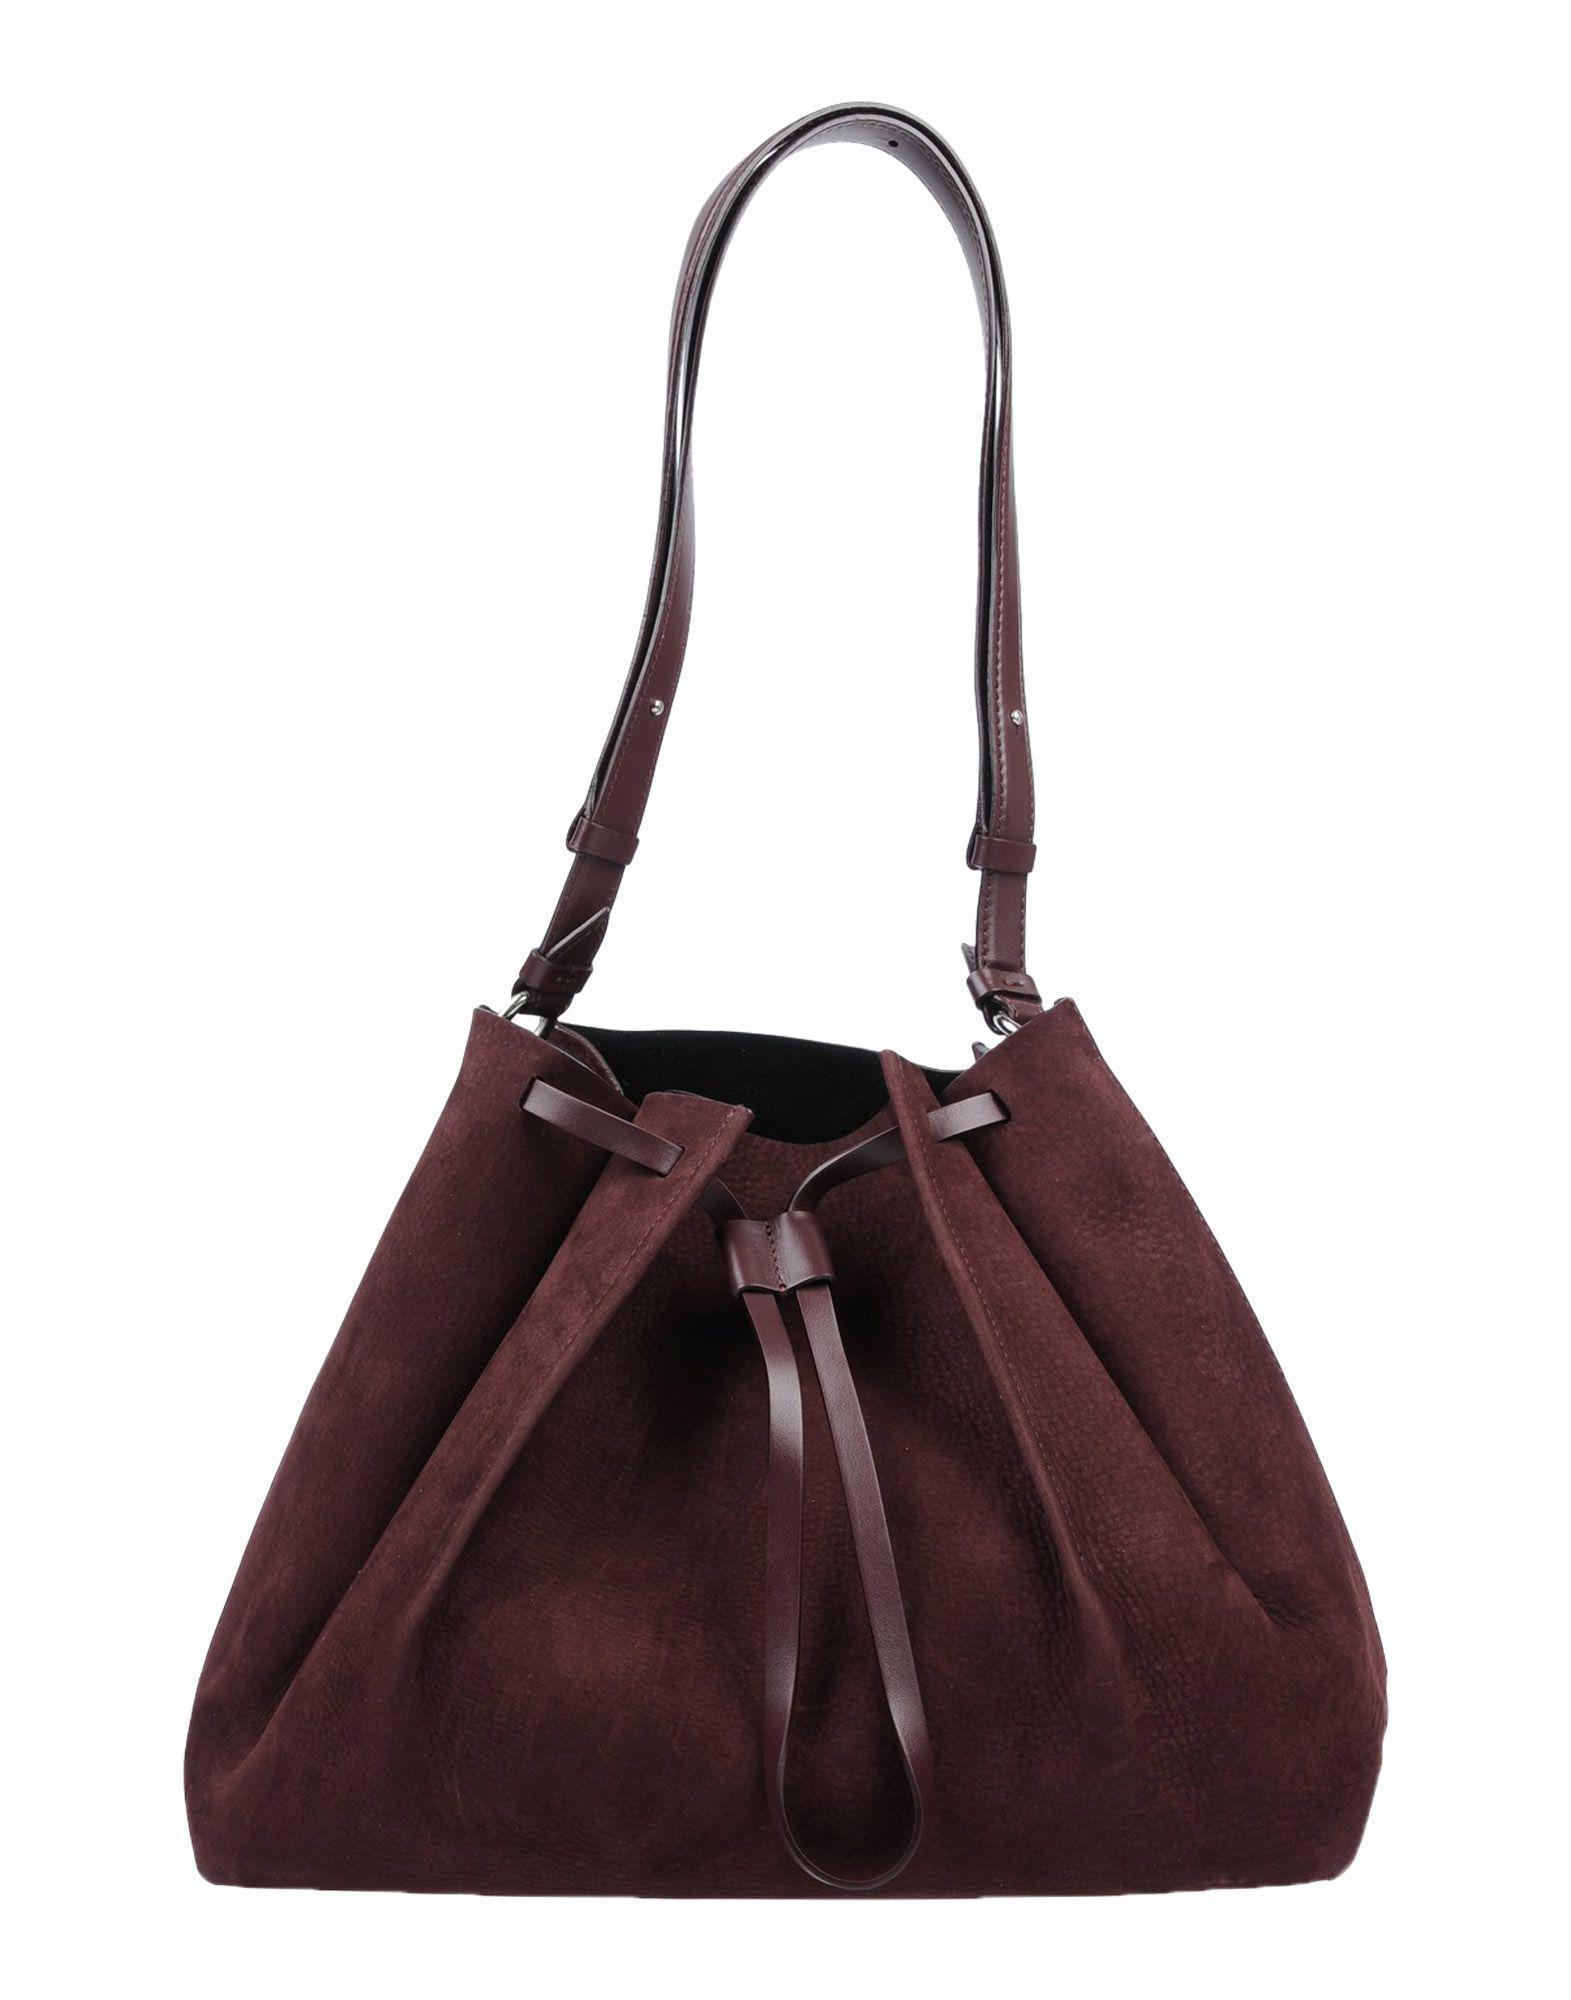 96e54f4da8 Maison Margiela Shoulder Bag in Brown - Lyst